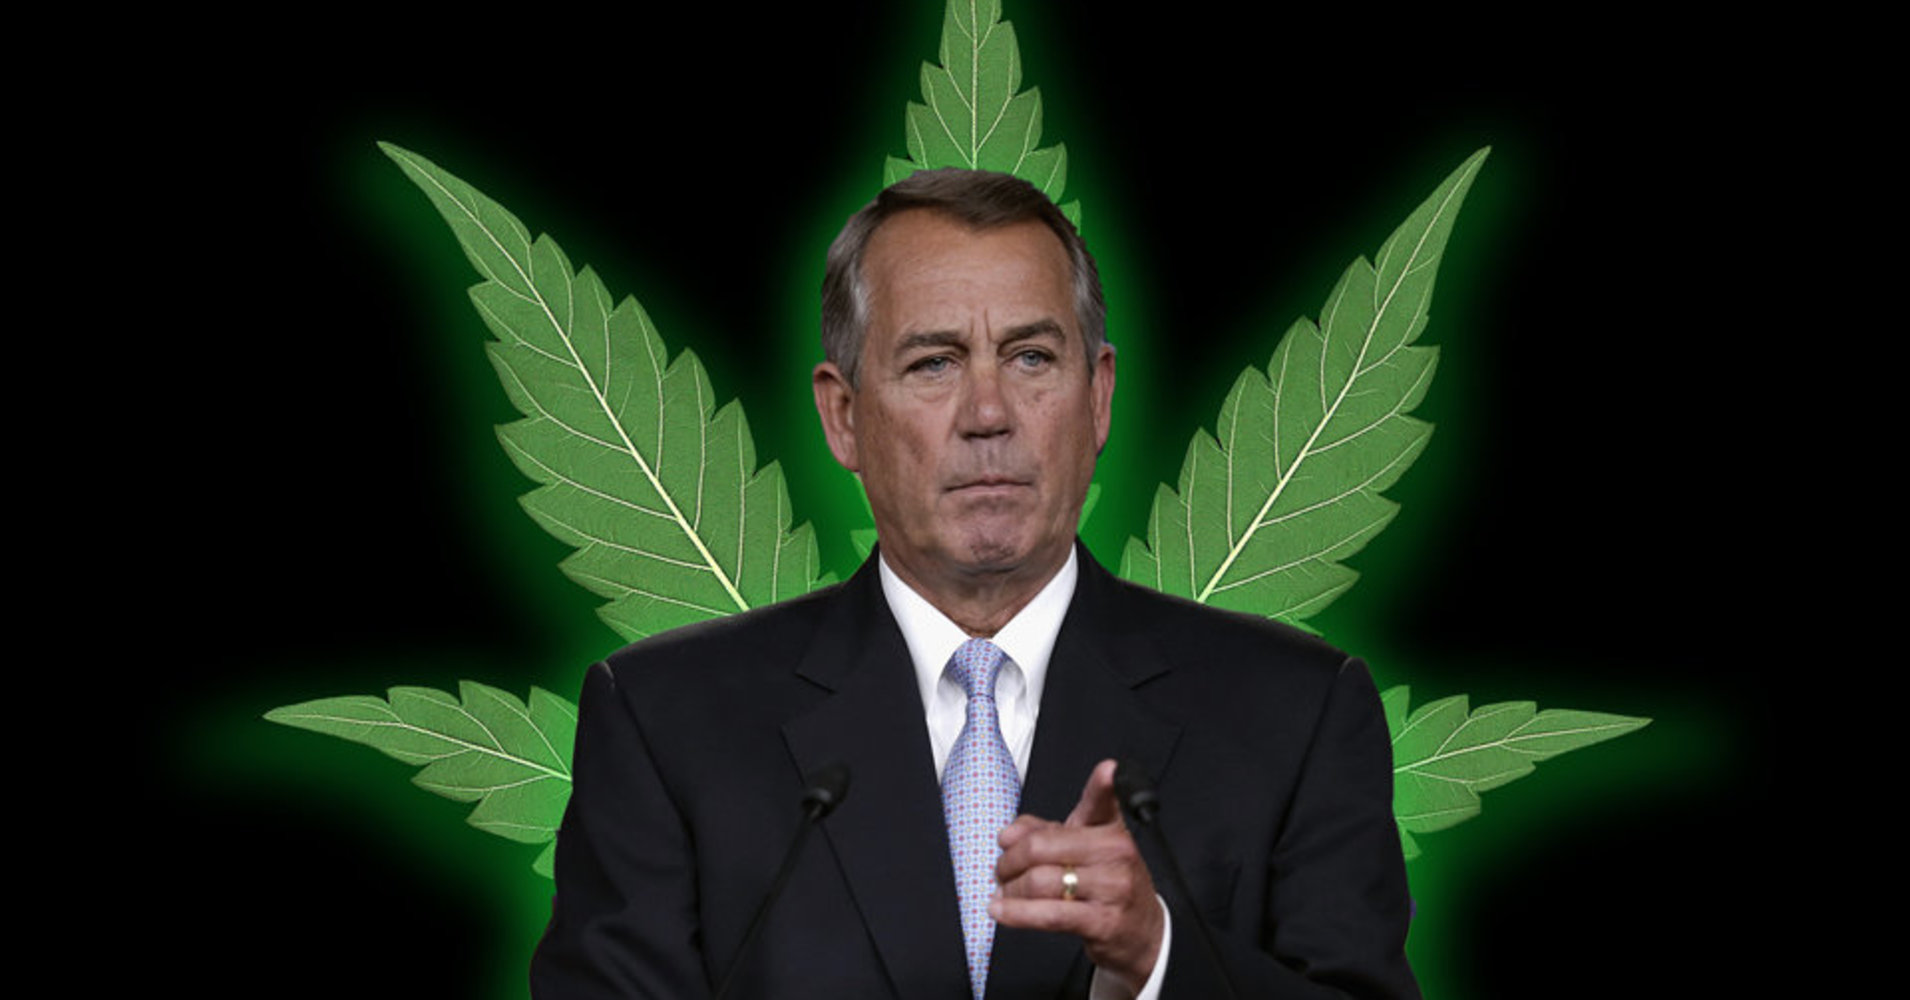 John Boehner Now Lobbying For Medical Marijuana